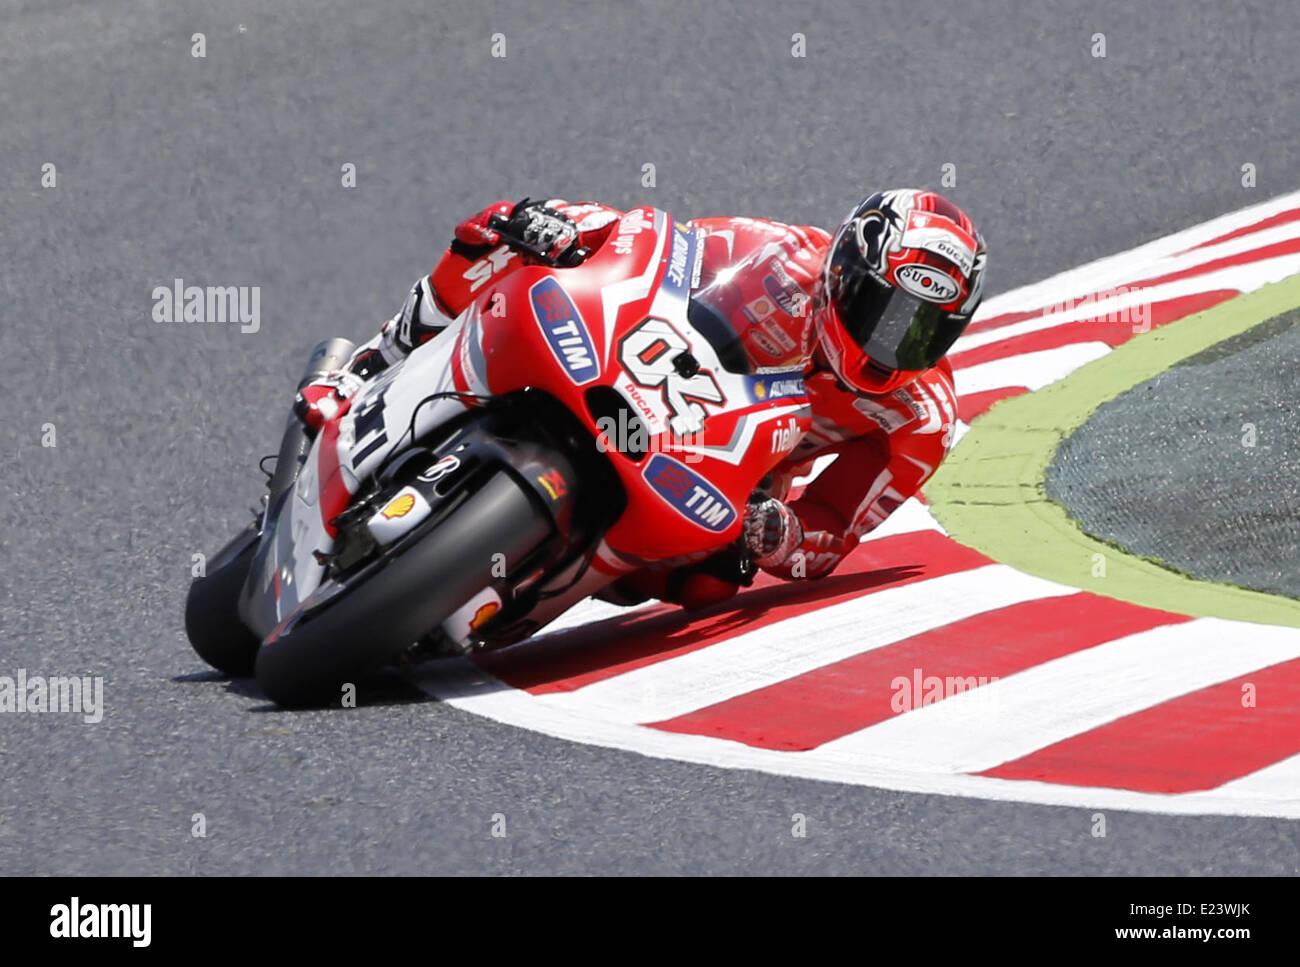 Andrea Dovizioso Stock Photos & Andrea Dovizioso Stock Images - Alamy